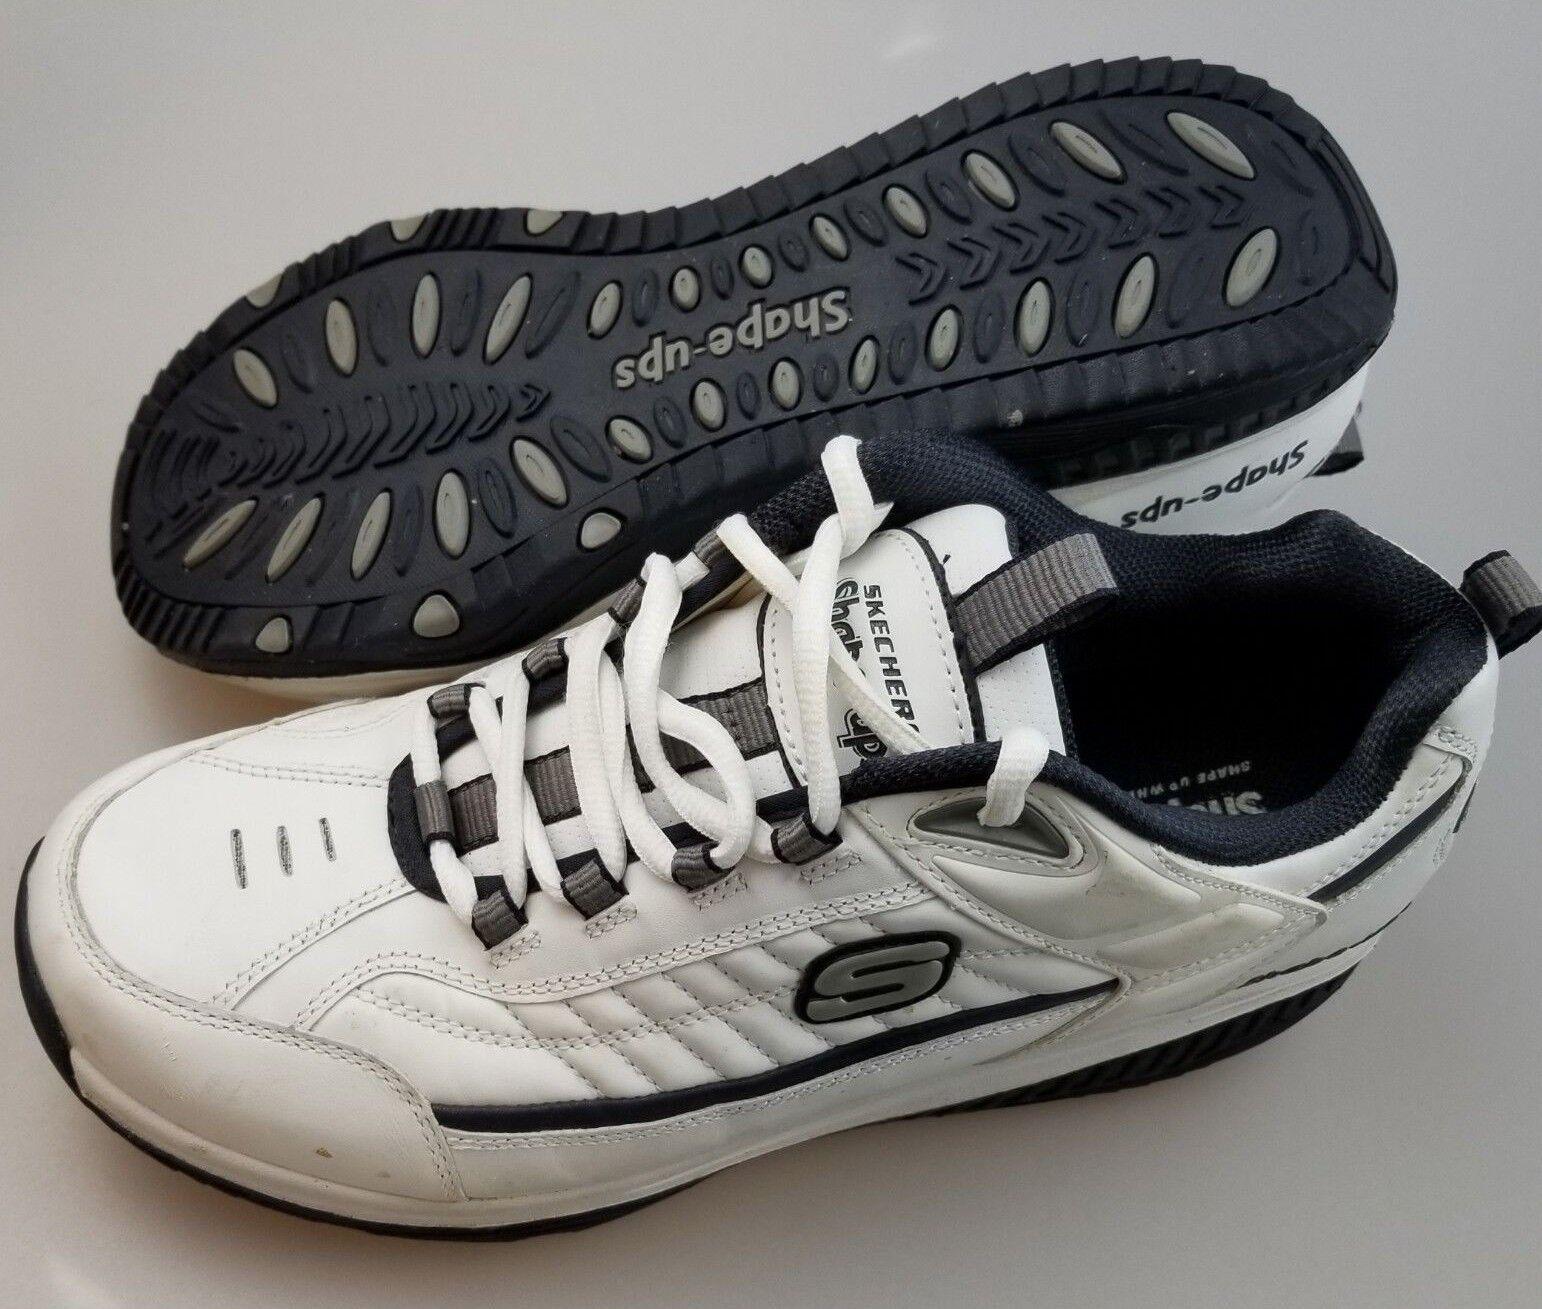 SKECHERS Shape Ups 52000 White Navy Lace Up Athletic shoes Men's US 11.5